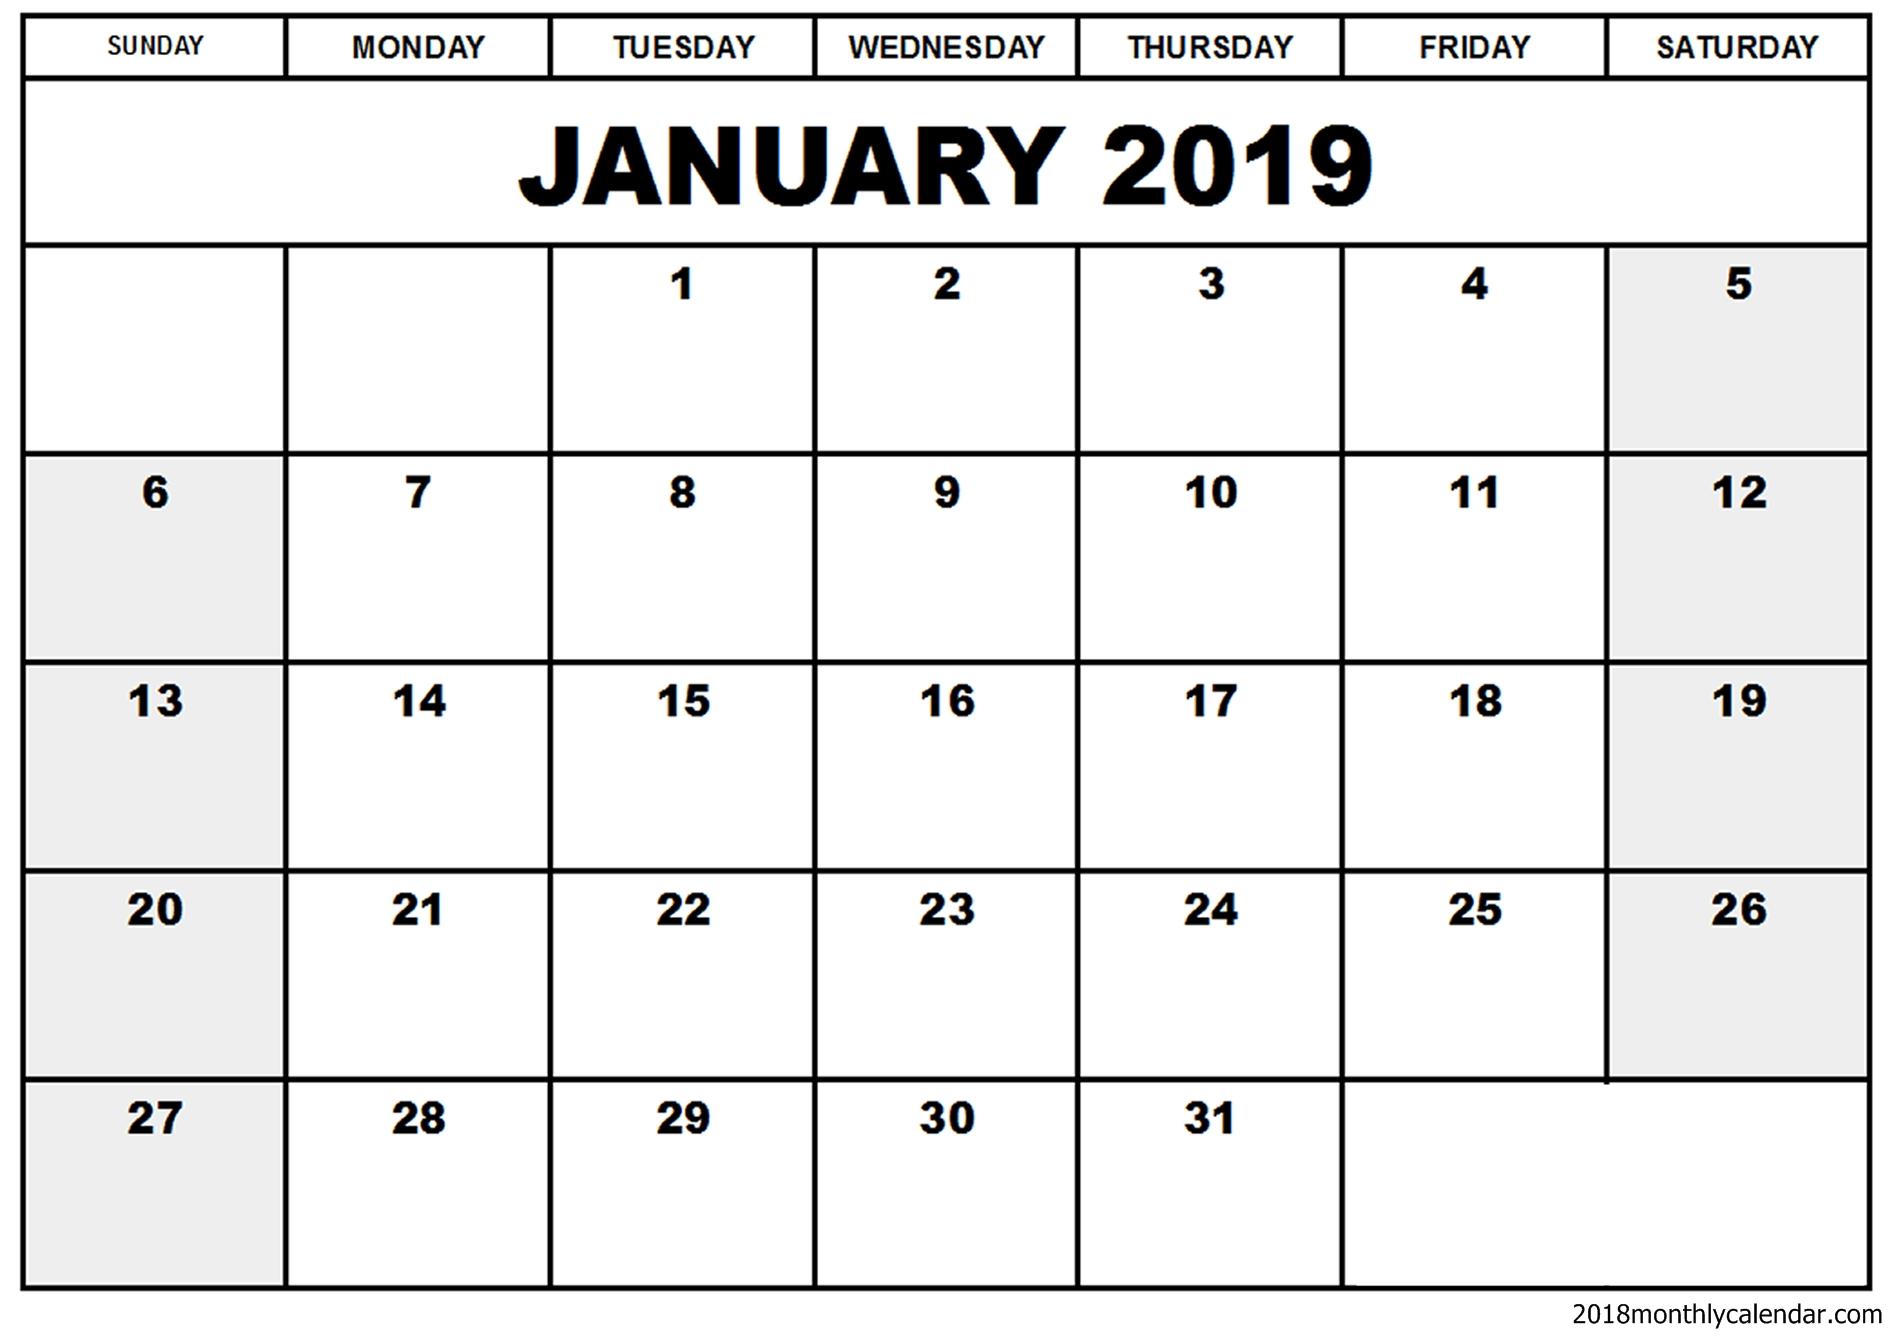 Blank January 2019 Calendar Template